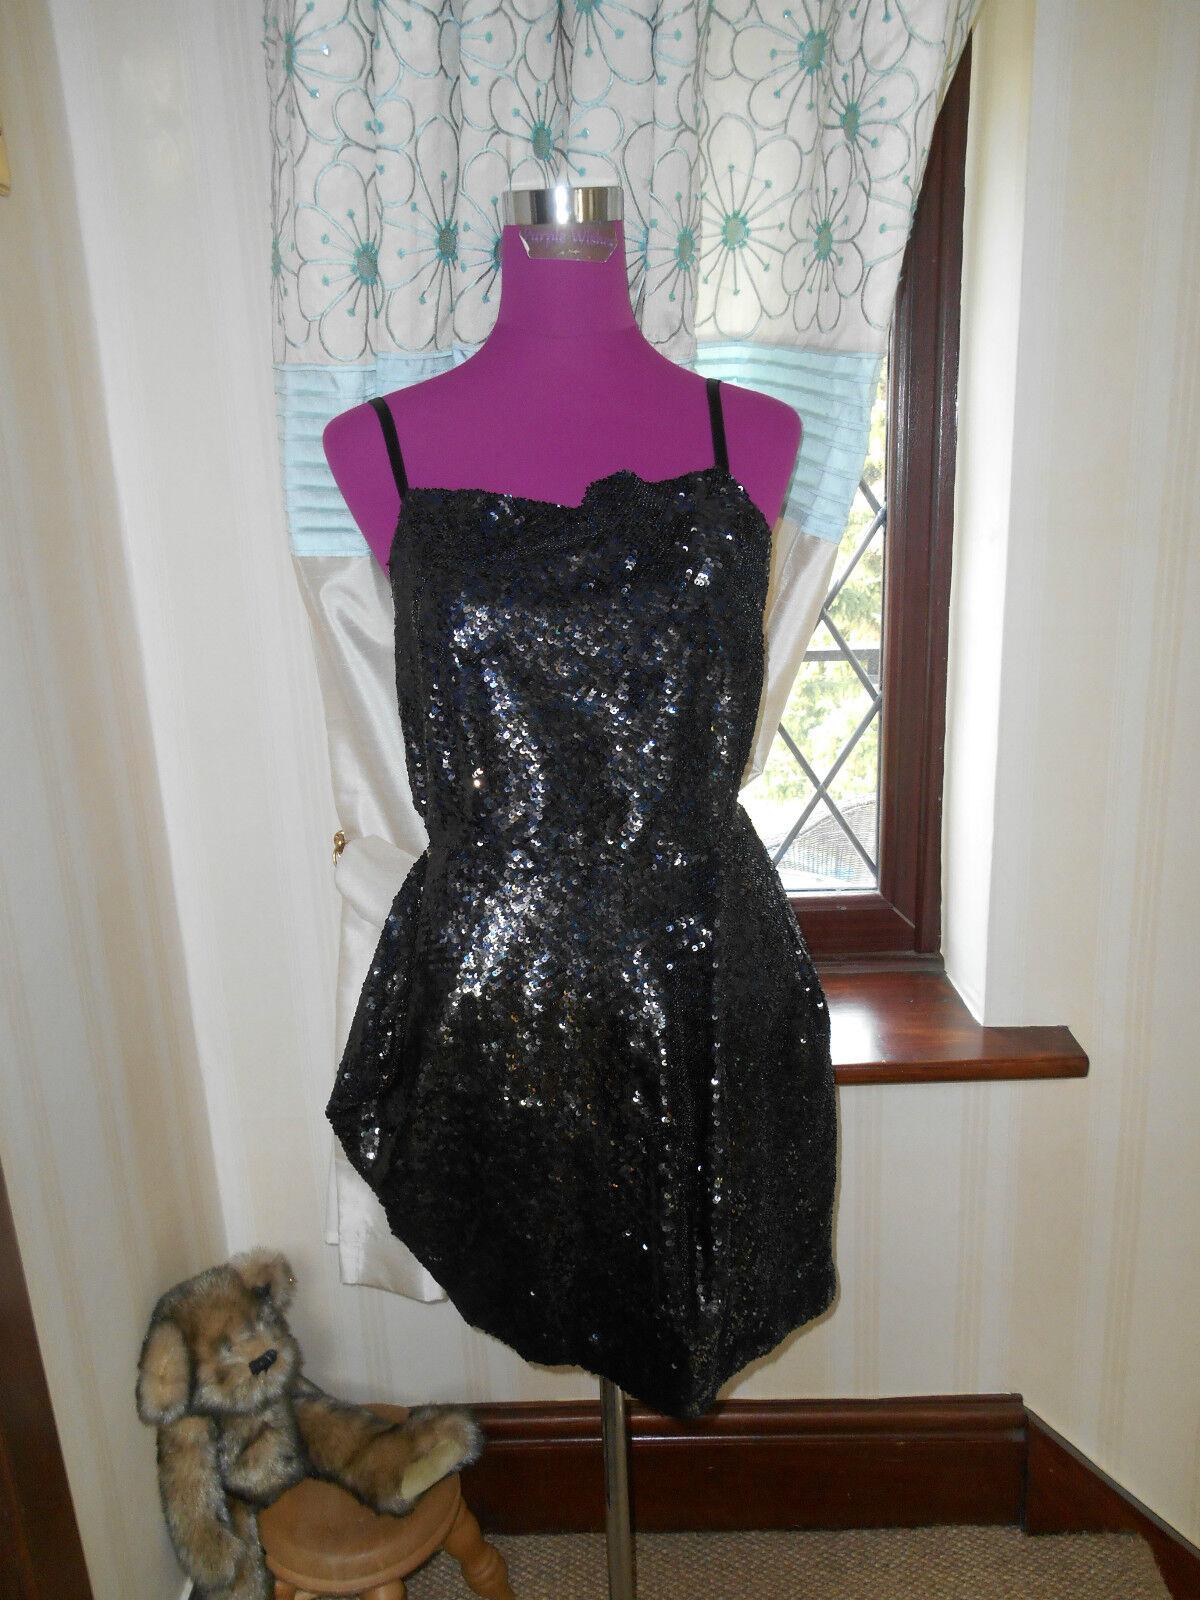 Stunning  All Saints Velutina Strap Sequin Dress Größe 10 BNWOT